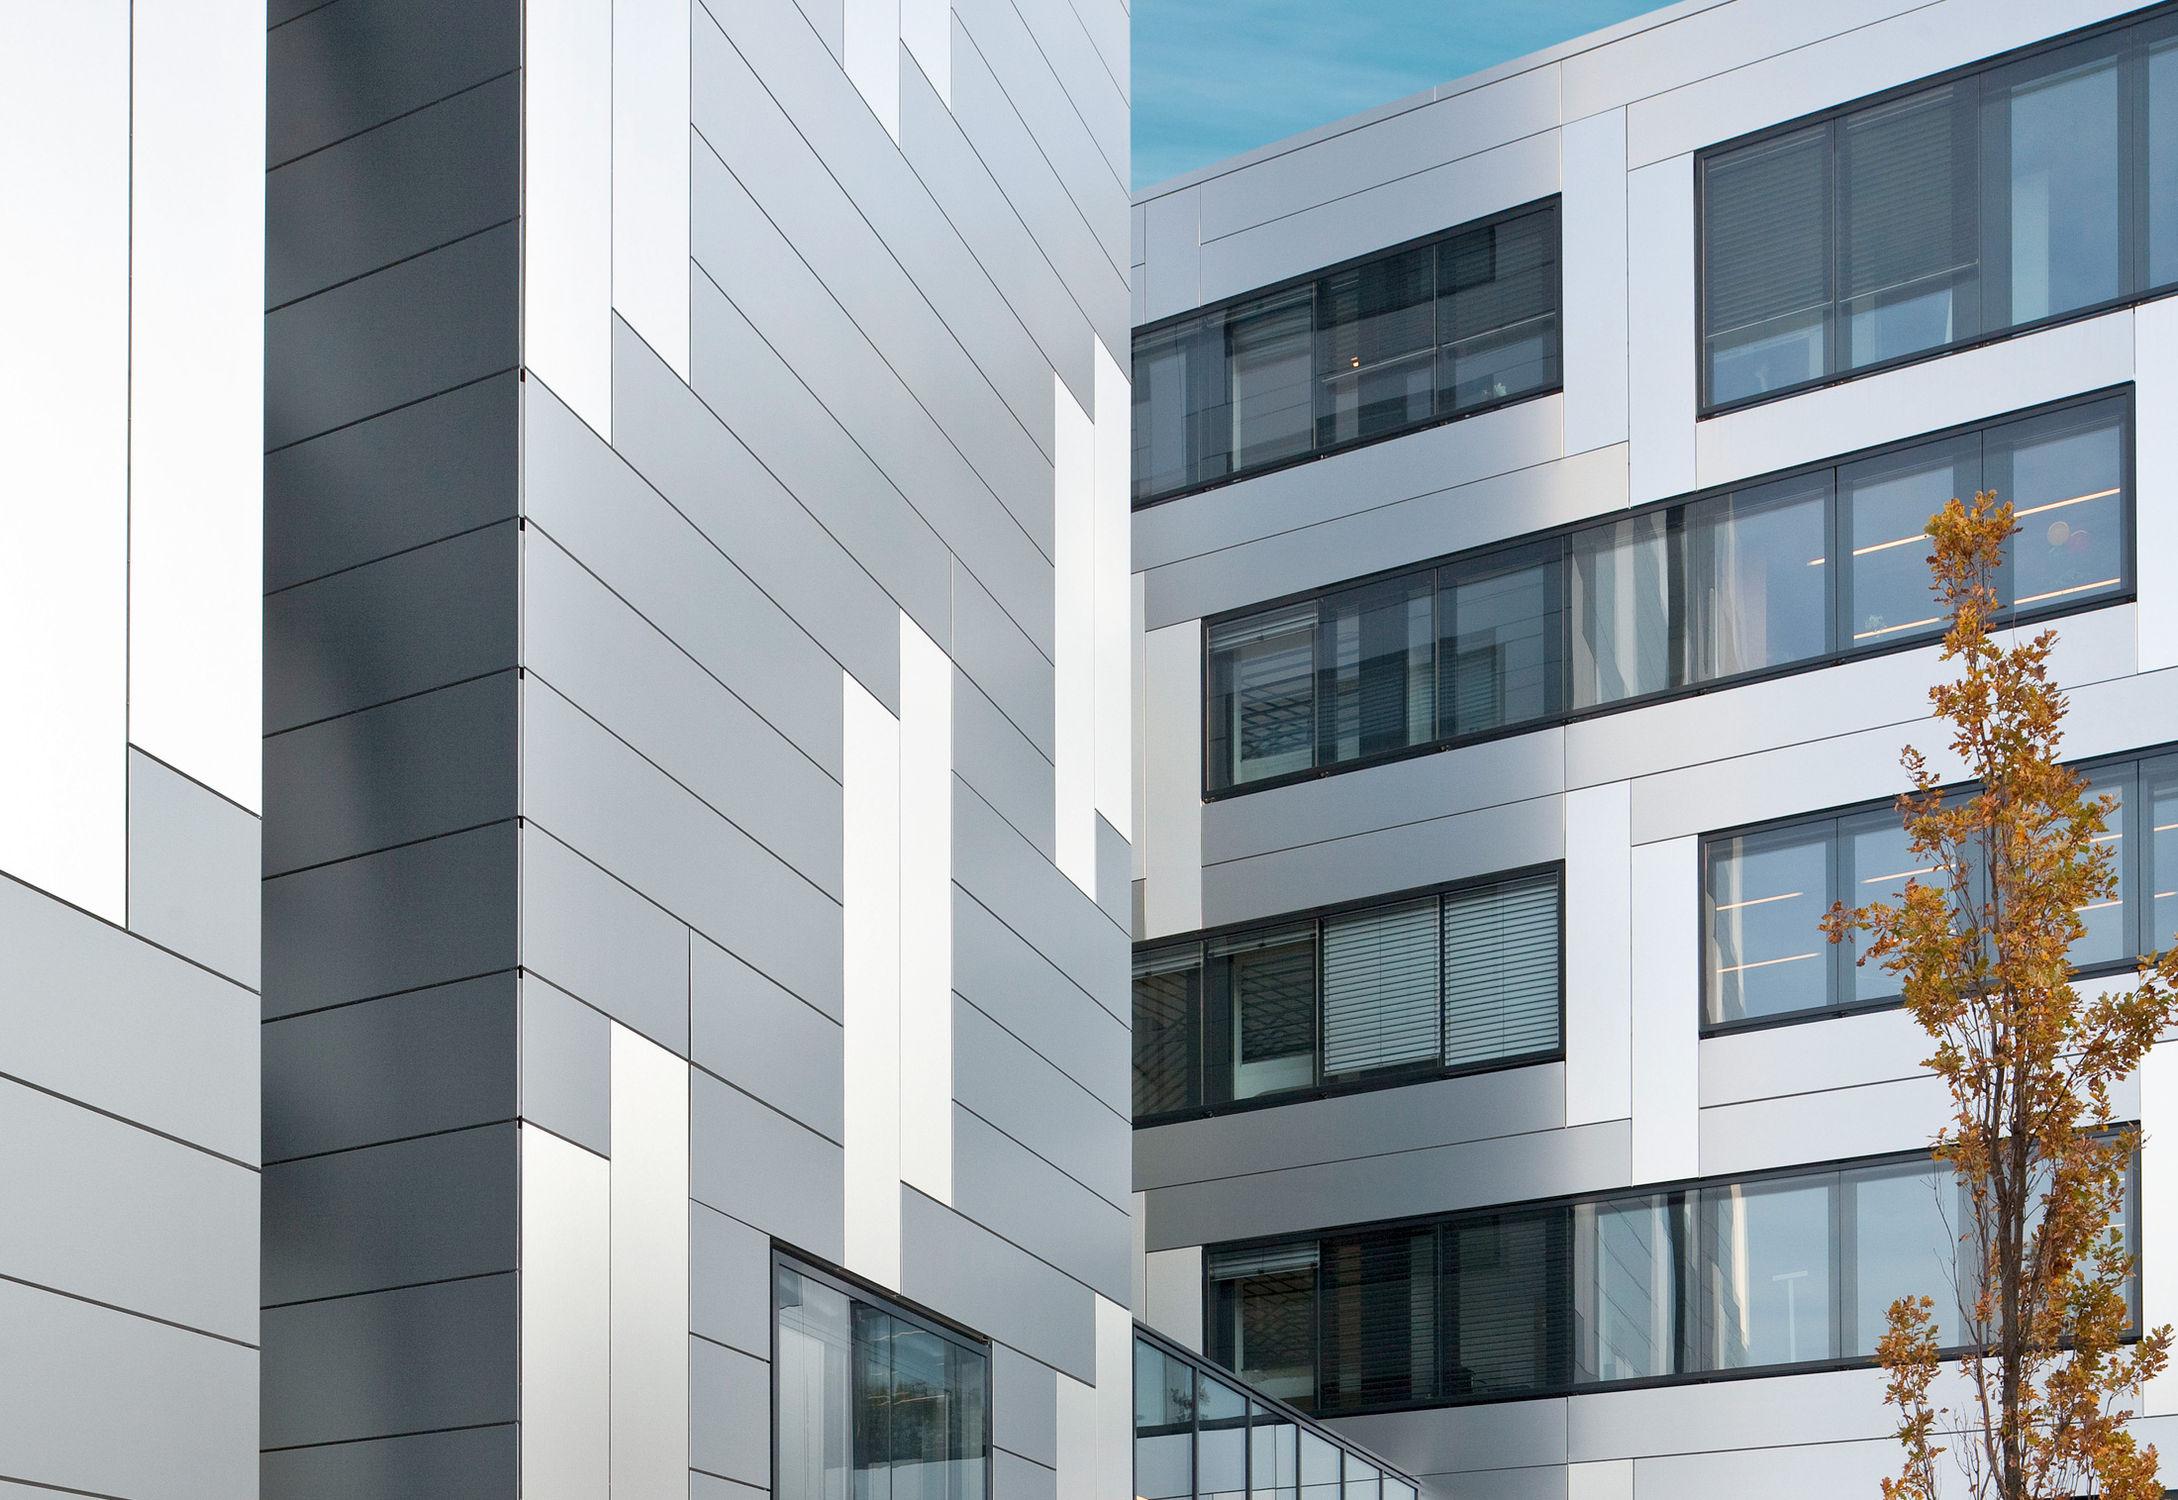 Composite Cladding Brushed Aluminum Brushed Patina - Architectural cladding